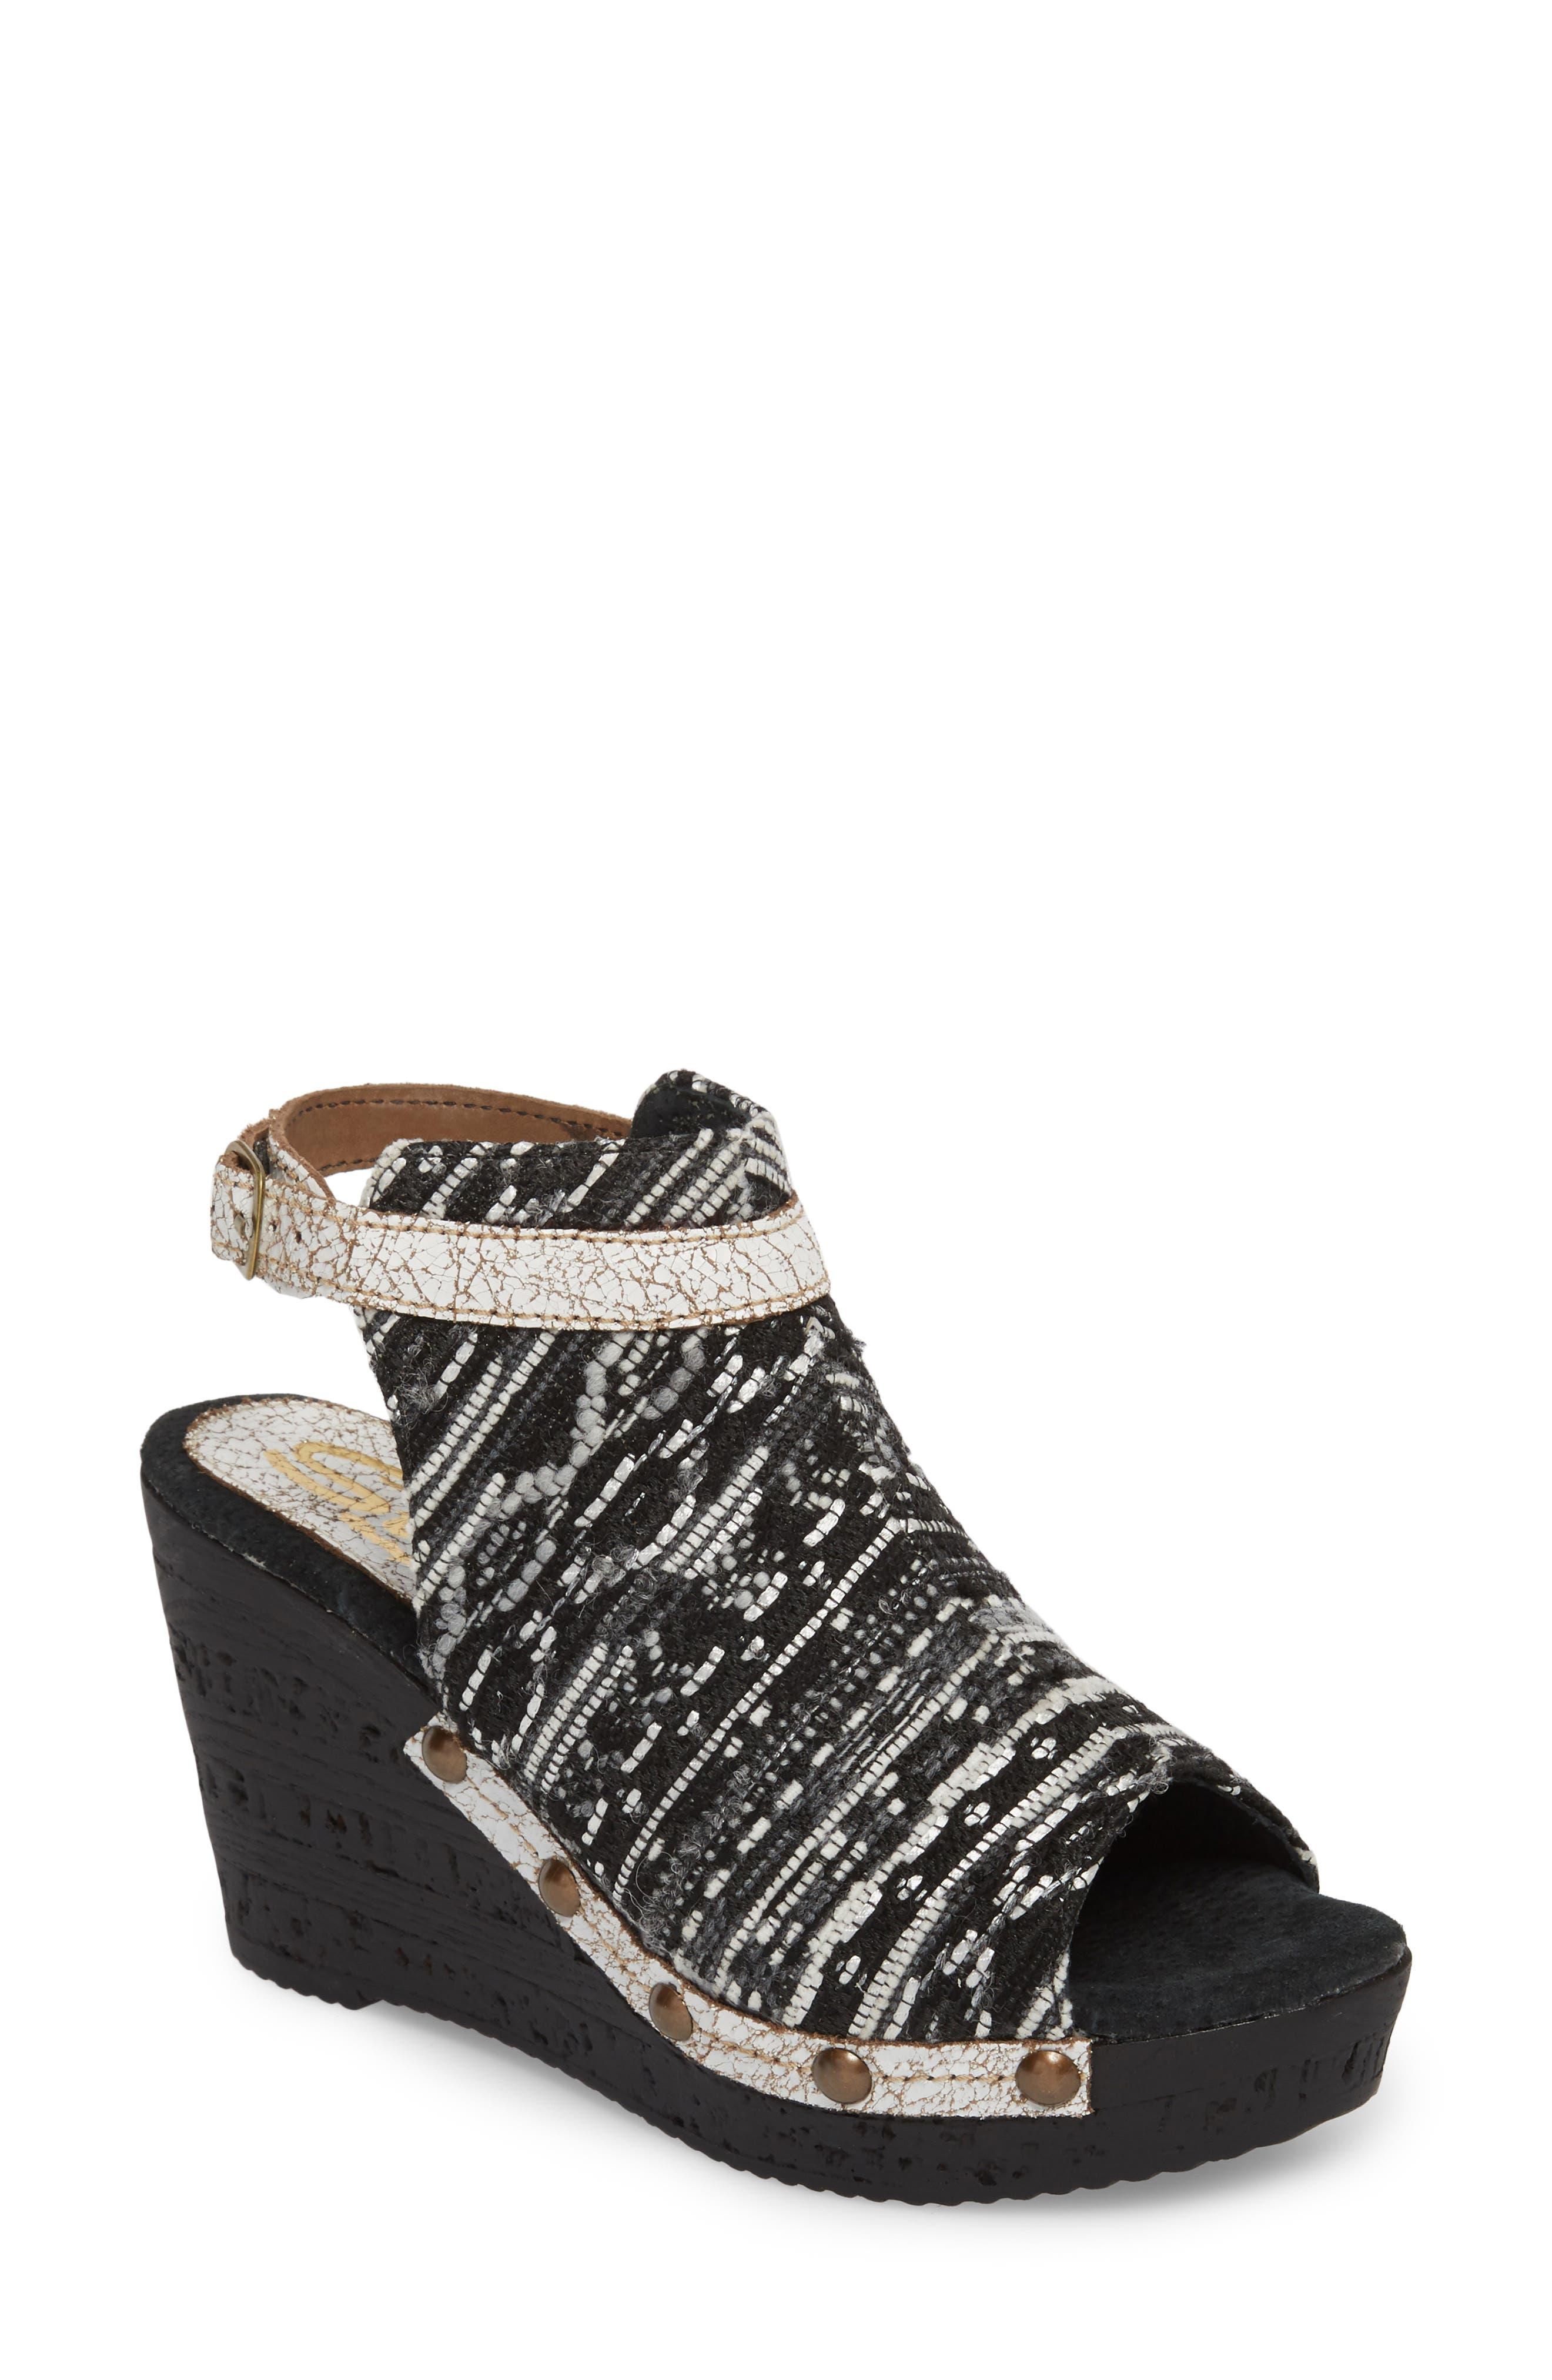 SBICCA Sabari Peep Toe Wedge Sandal, Main, color, 001